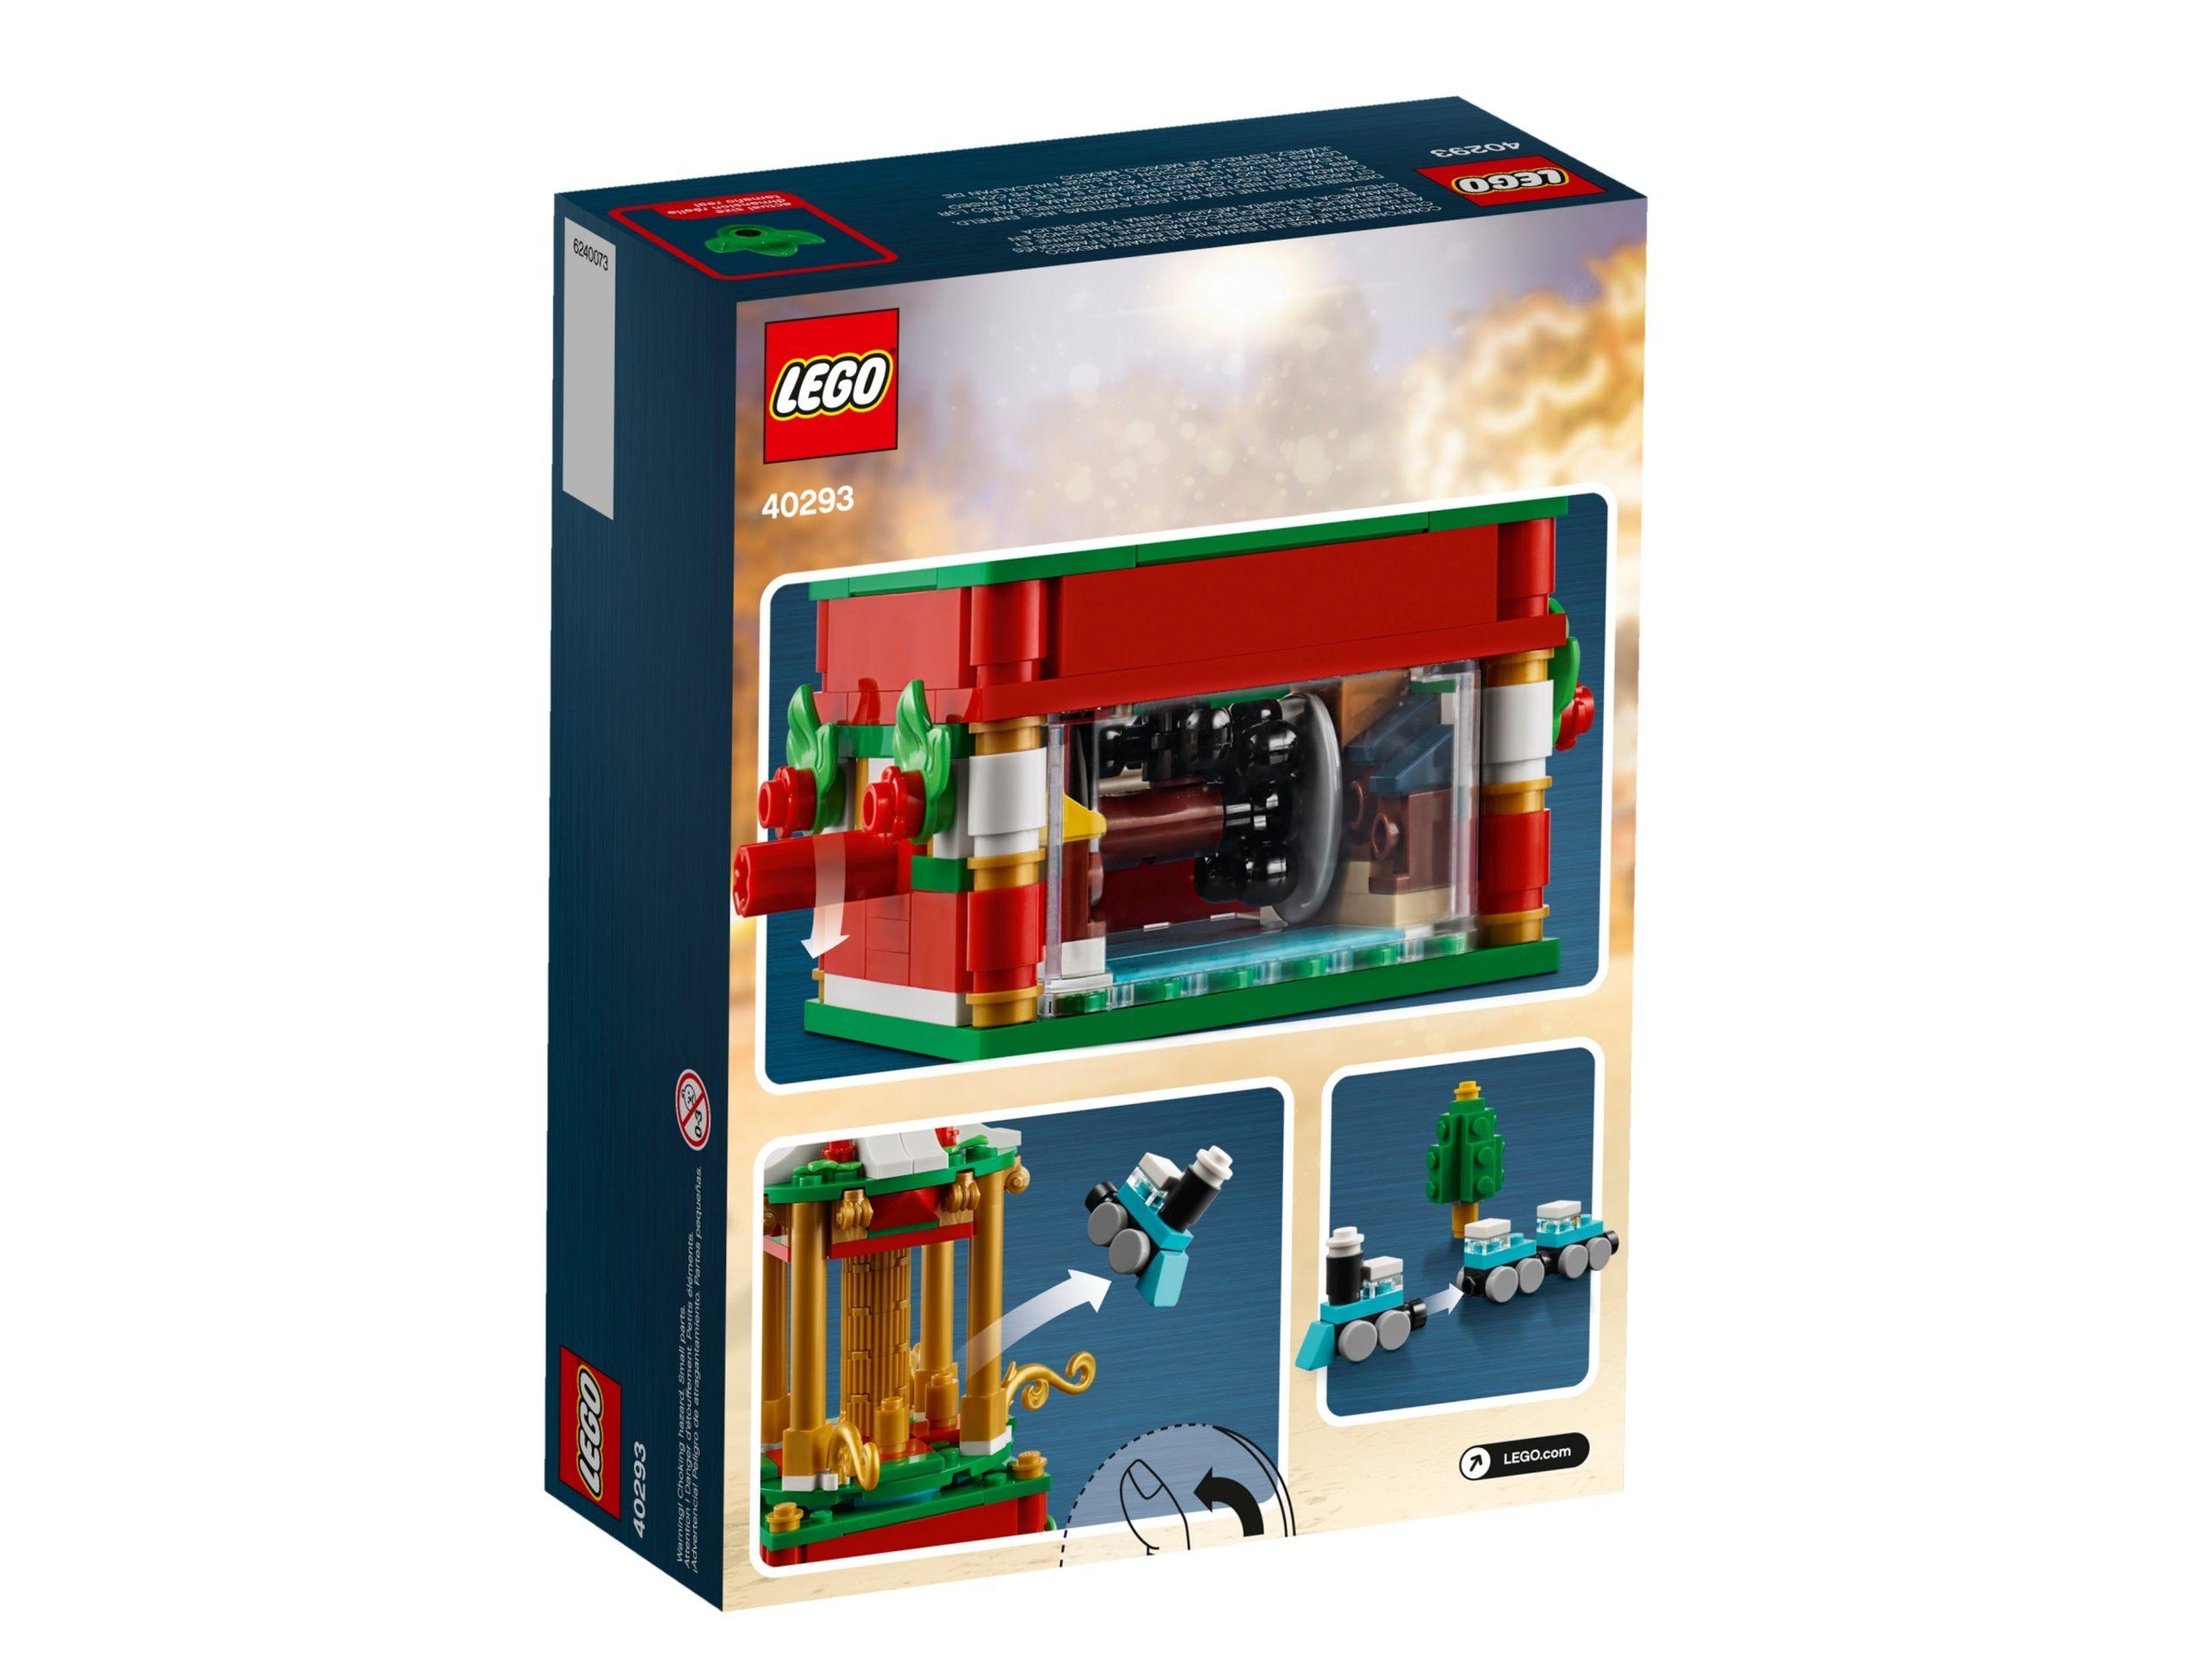 lego 40293 weihnachtskarussell scaled